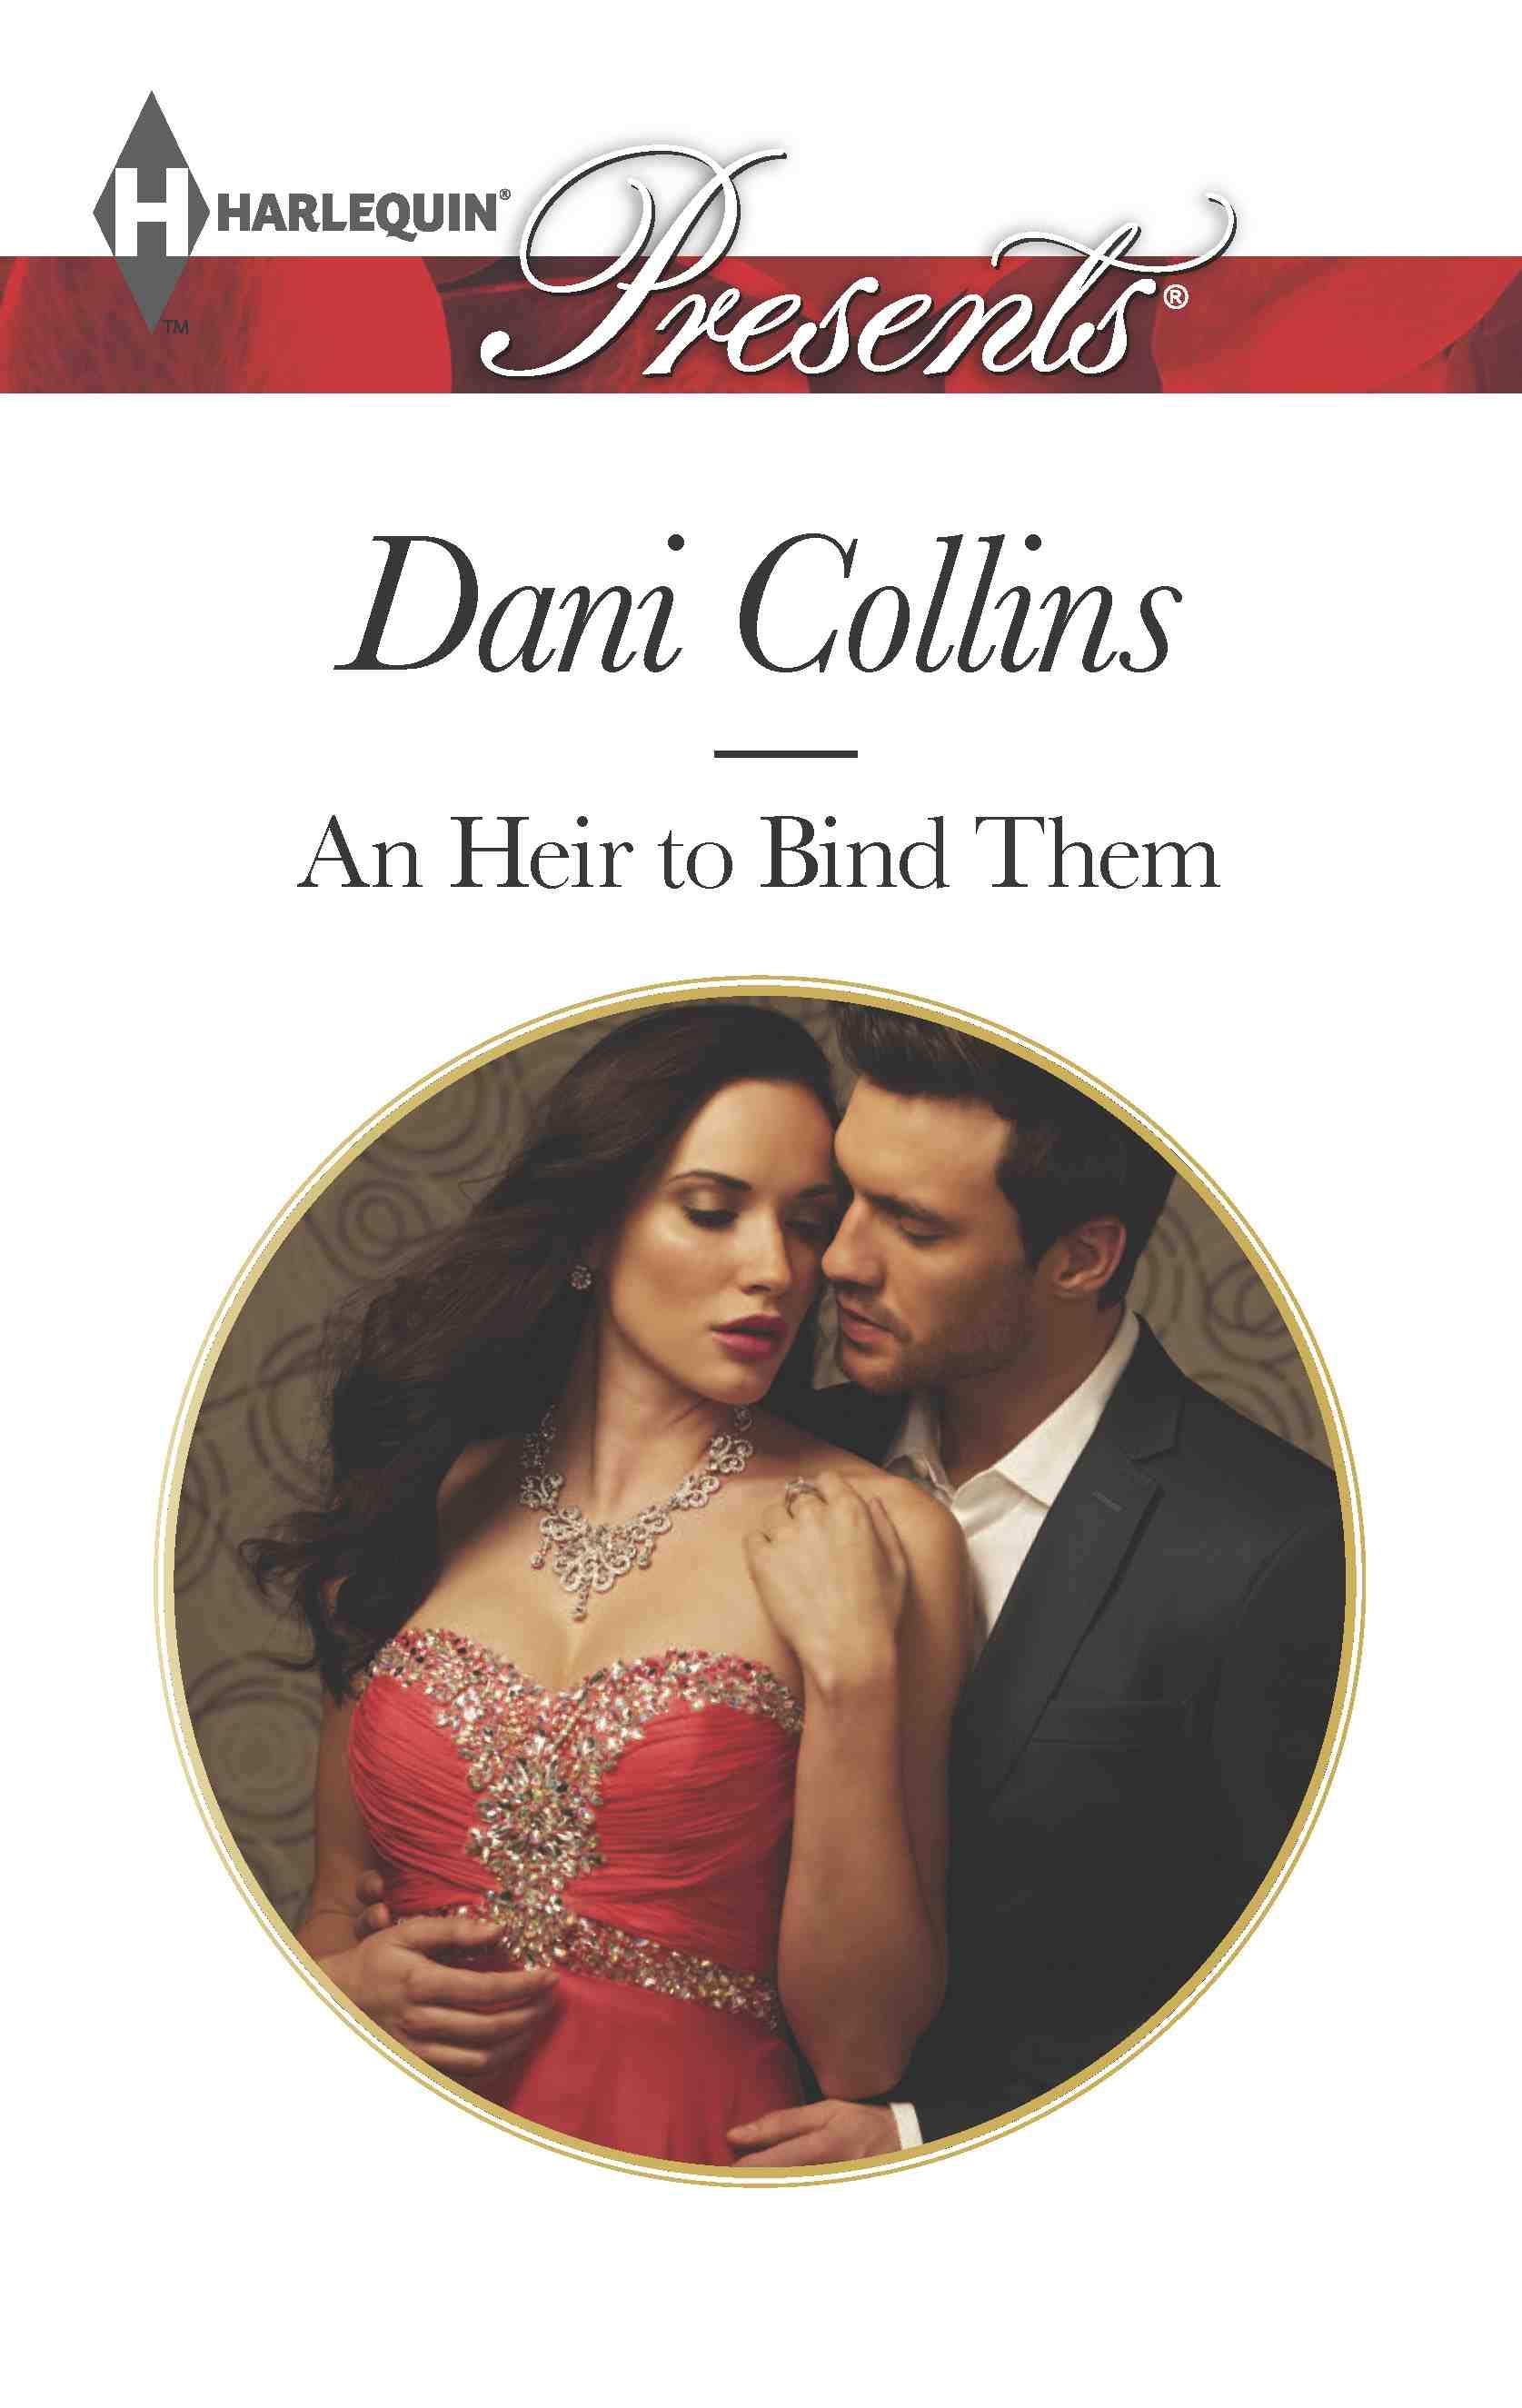 An-Heir-To-Bind-Them-Dani-Collins.jpg